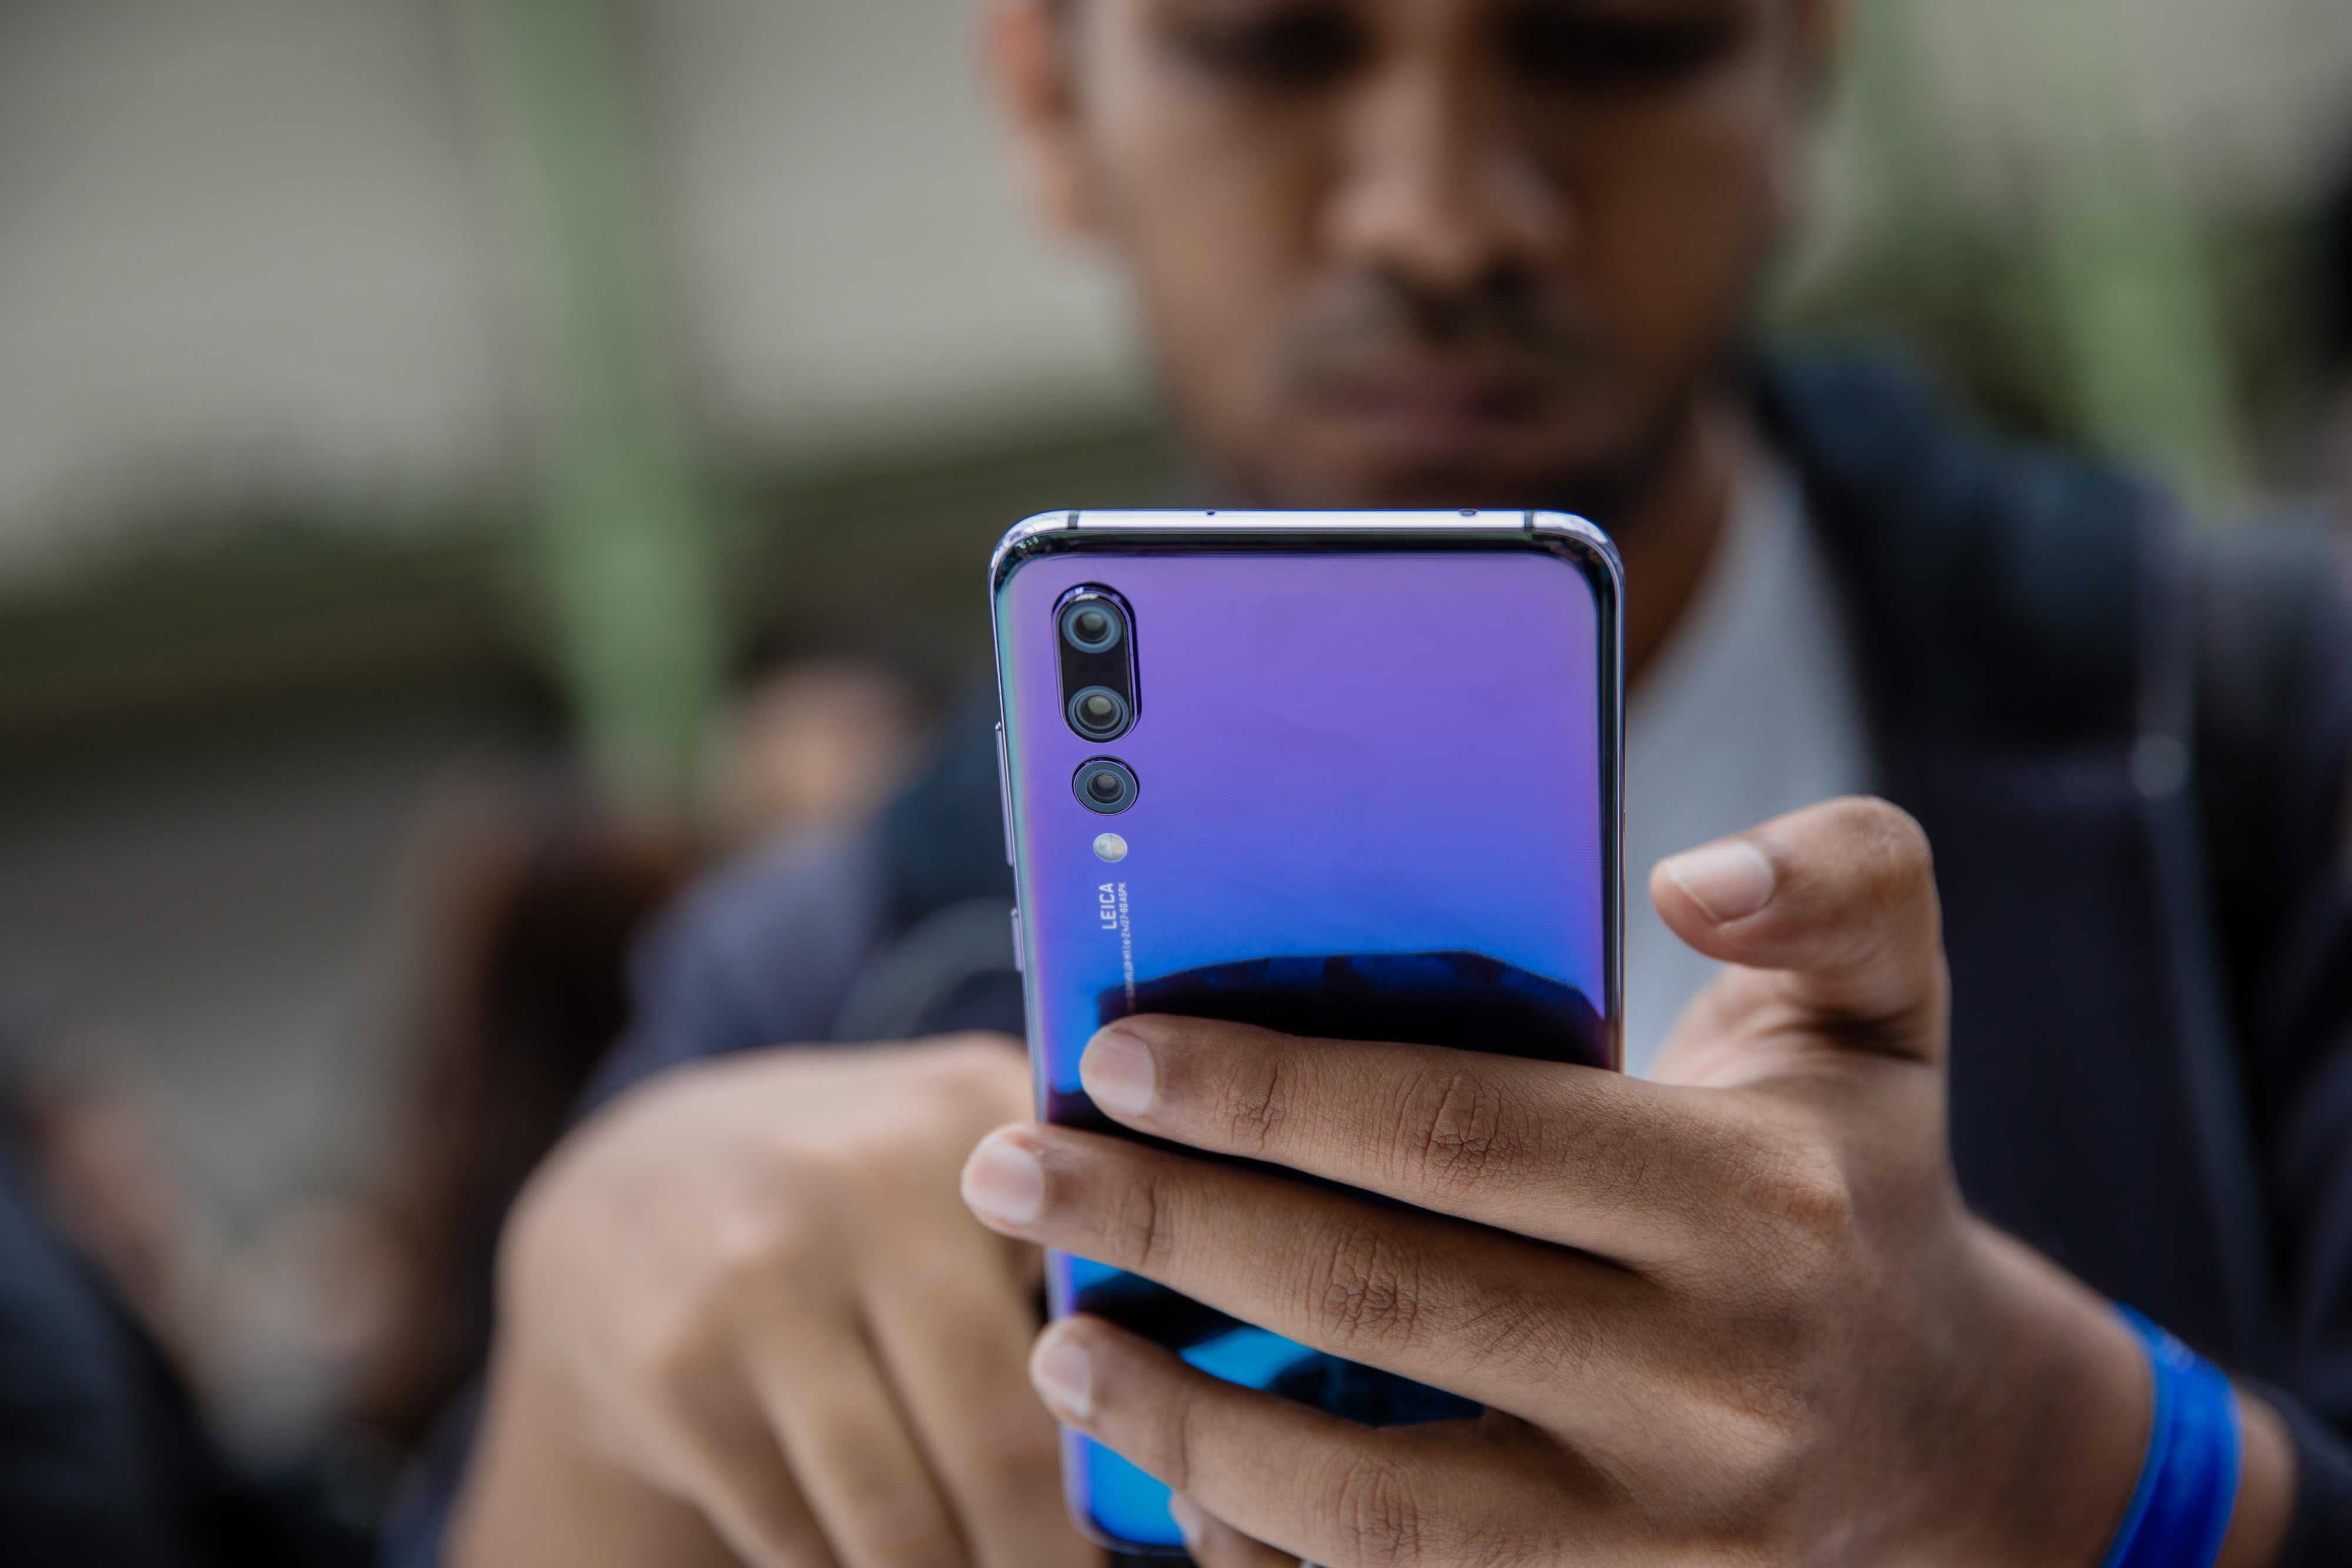 Huawei arrest: What is Huawei?